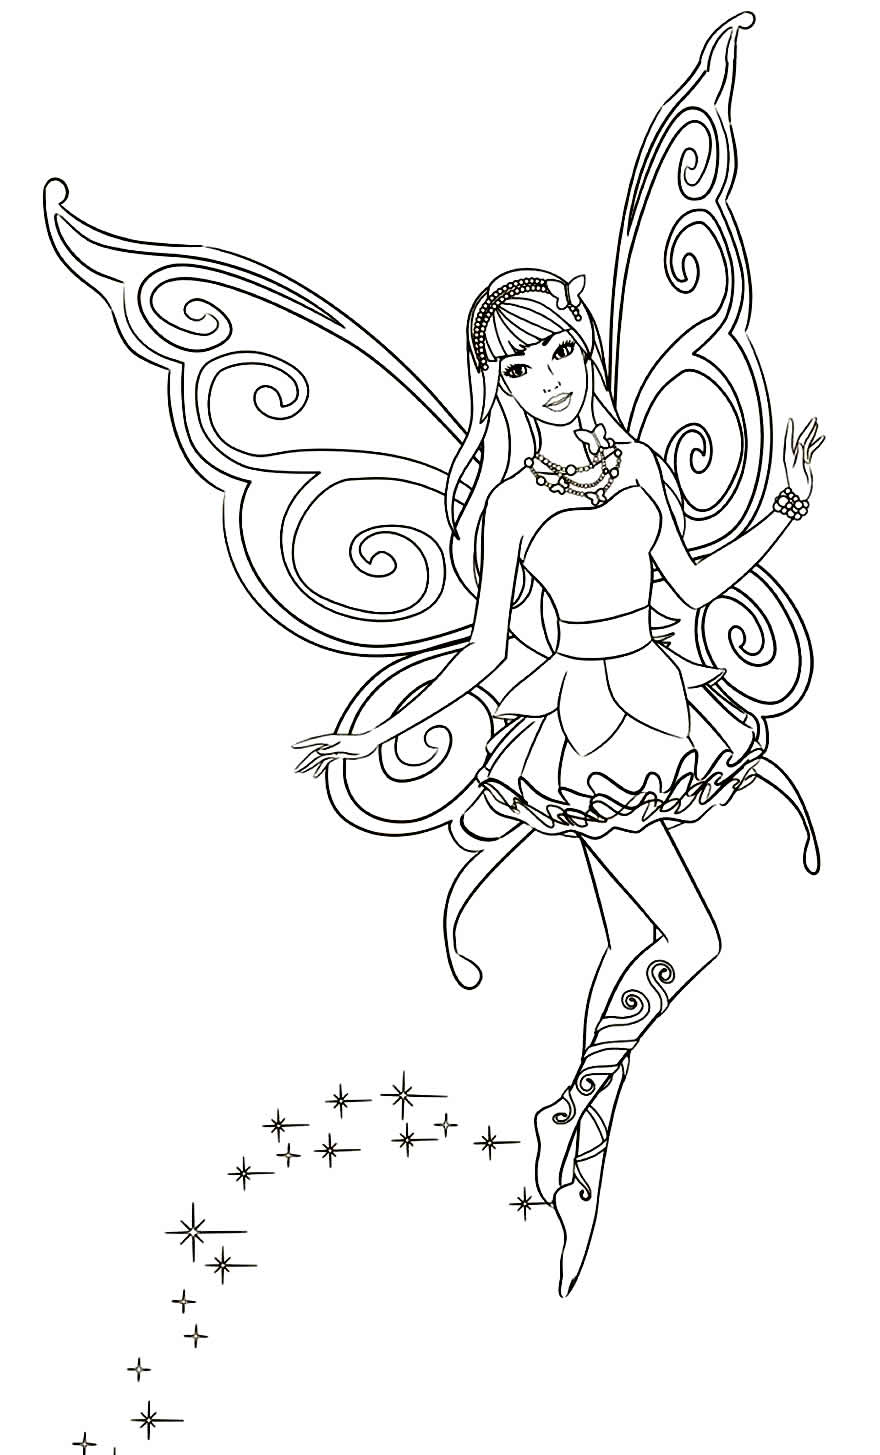 Desenho de Fada para pintar e colorir